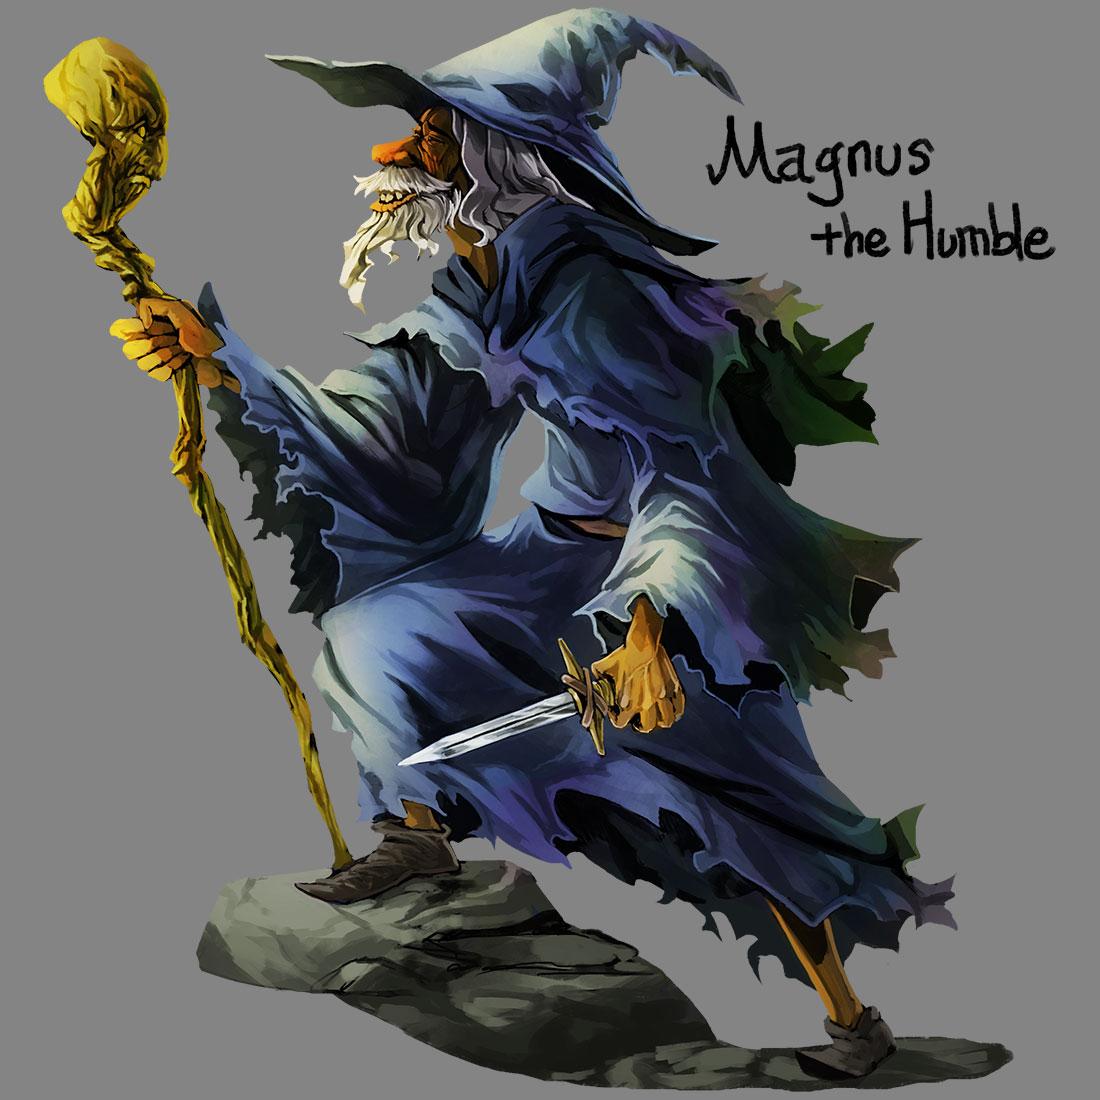 Magnus the Humble